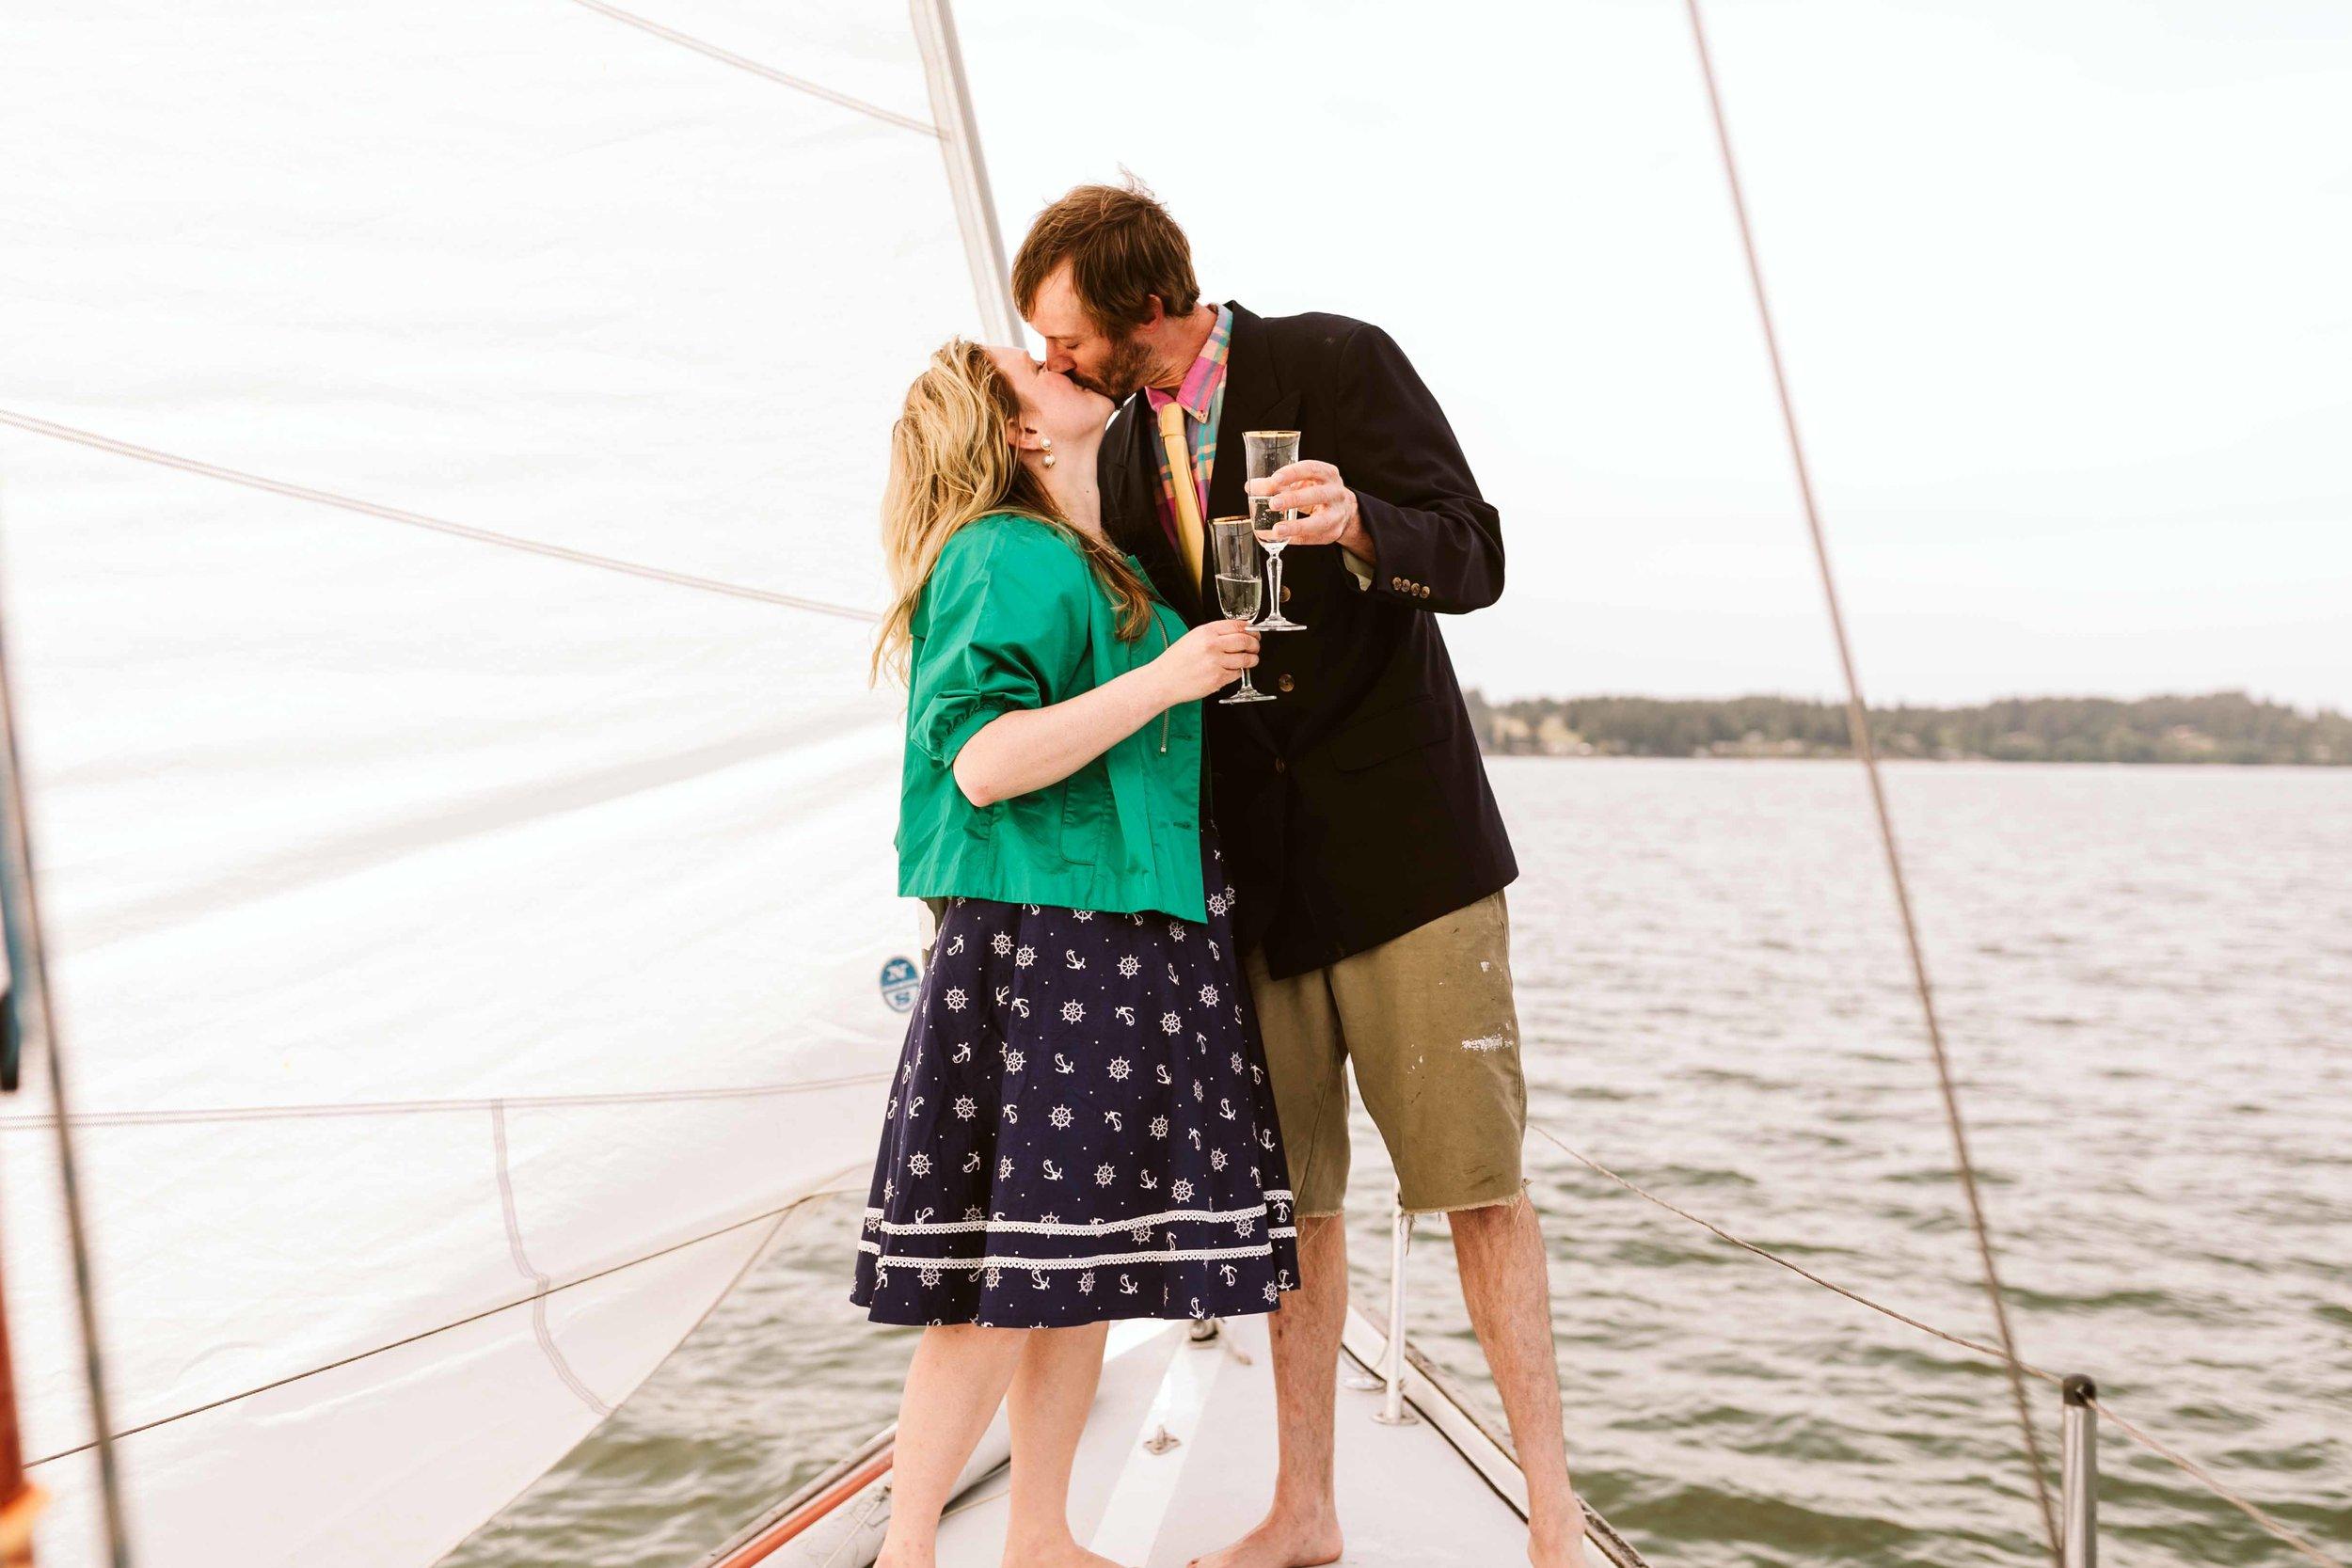 sailboat-engagement-photos-3.jpg